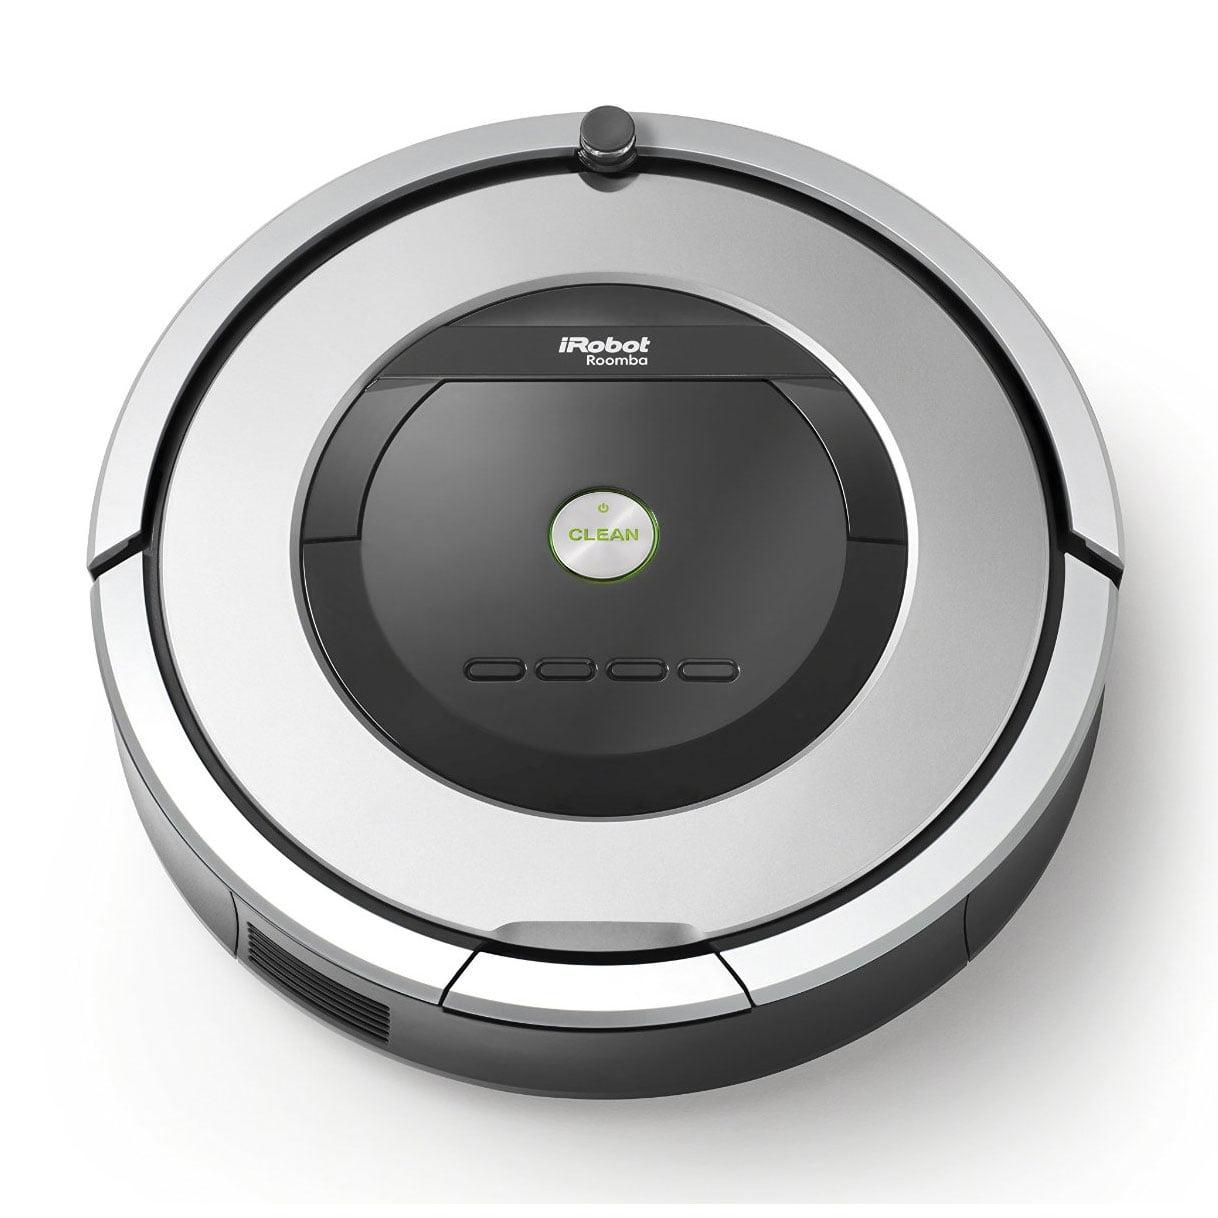 iRobot Roomba 860 Robotic Vacuum